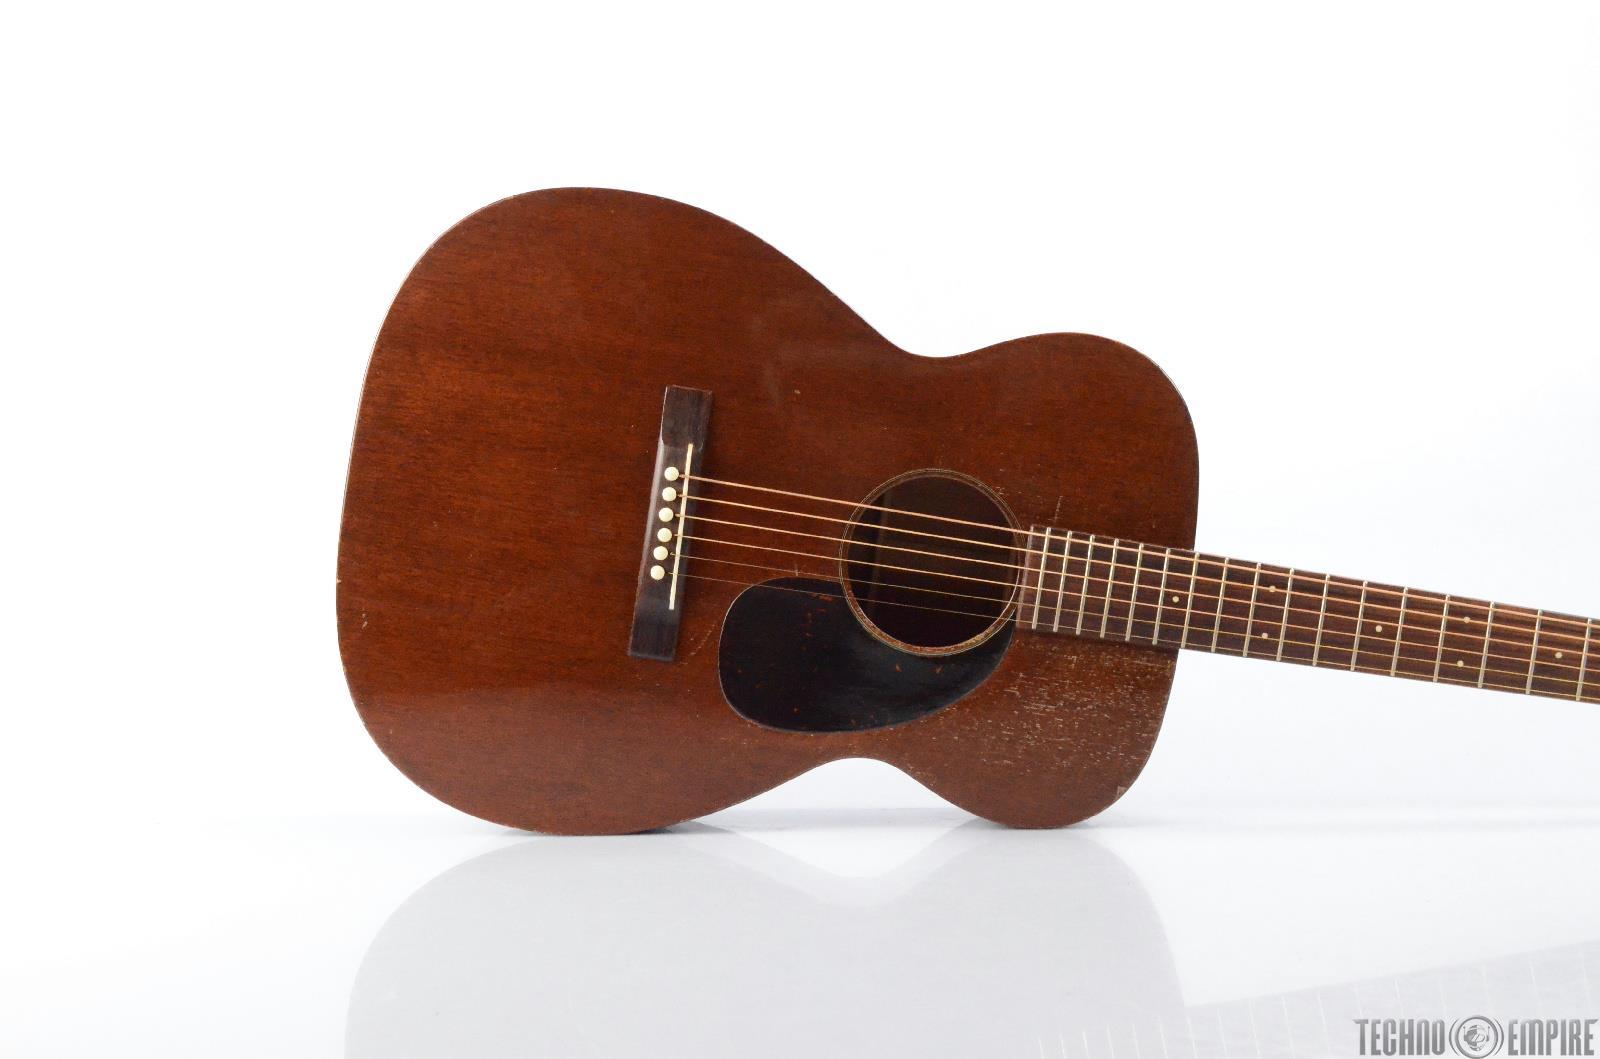 1956 Martin 00-17 Orchestra Acoustic Guitar w/ Hard Gig Case #29238